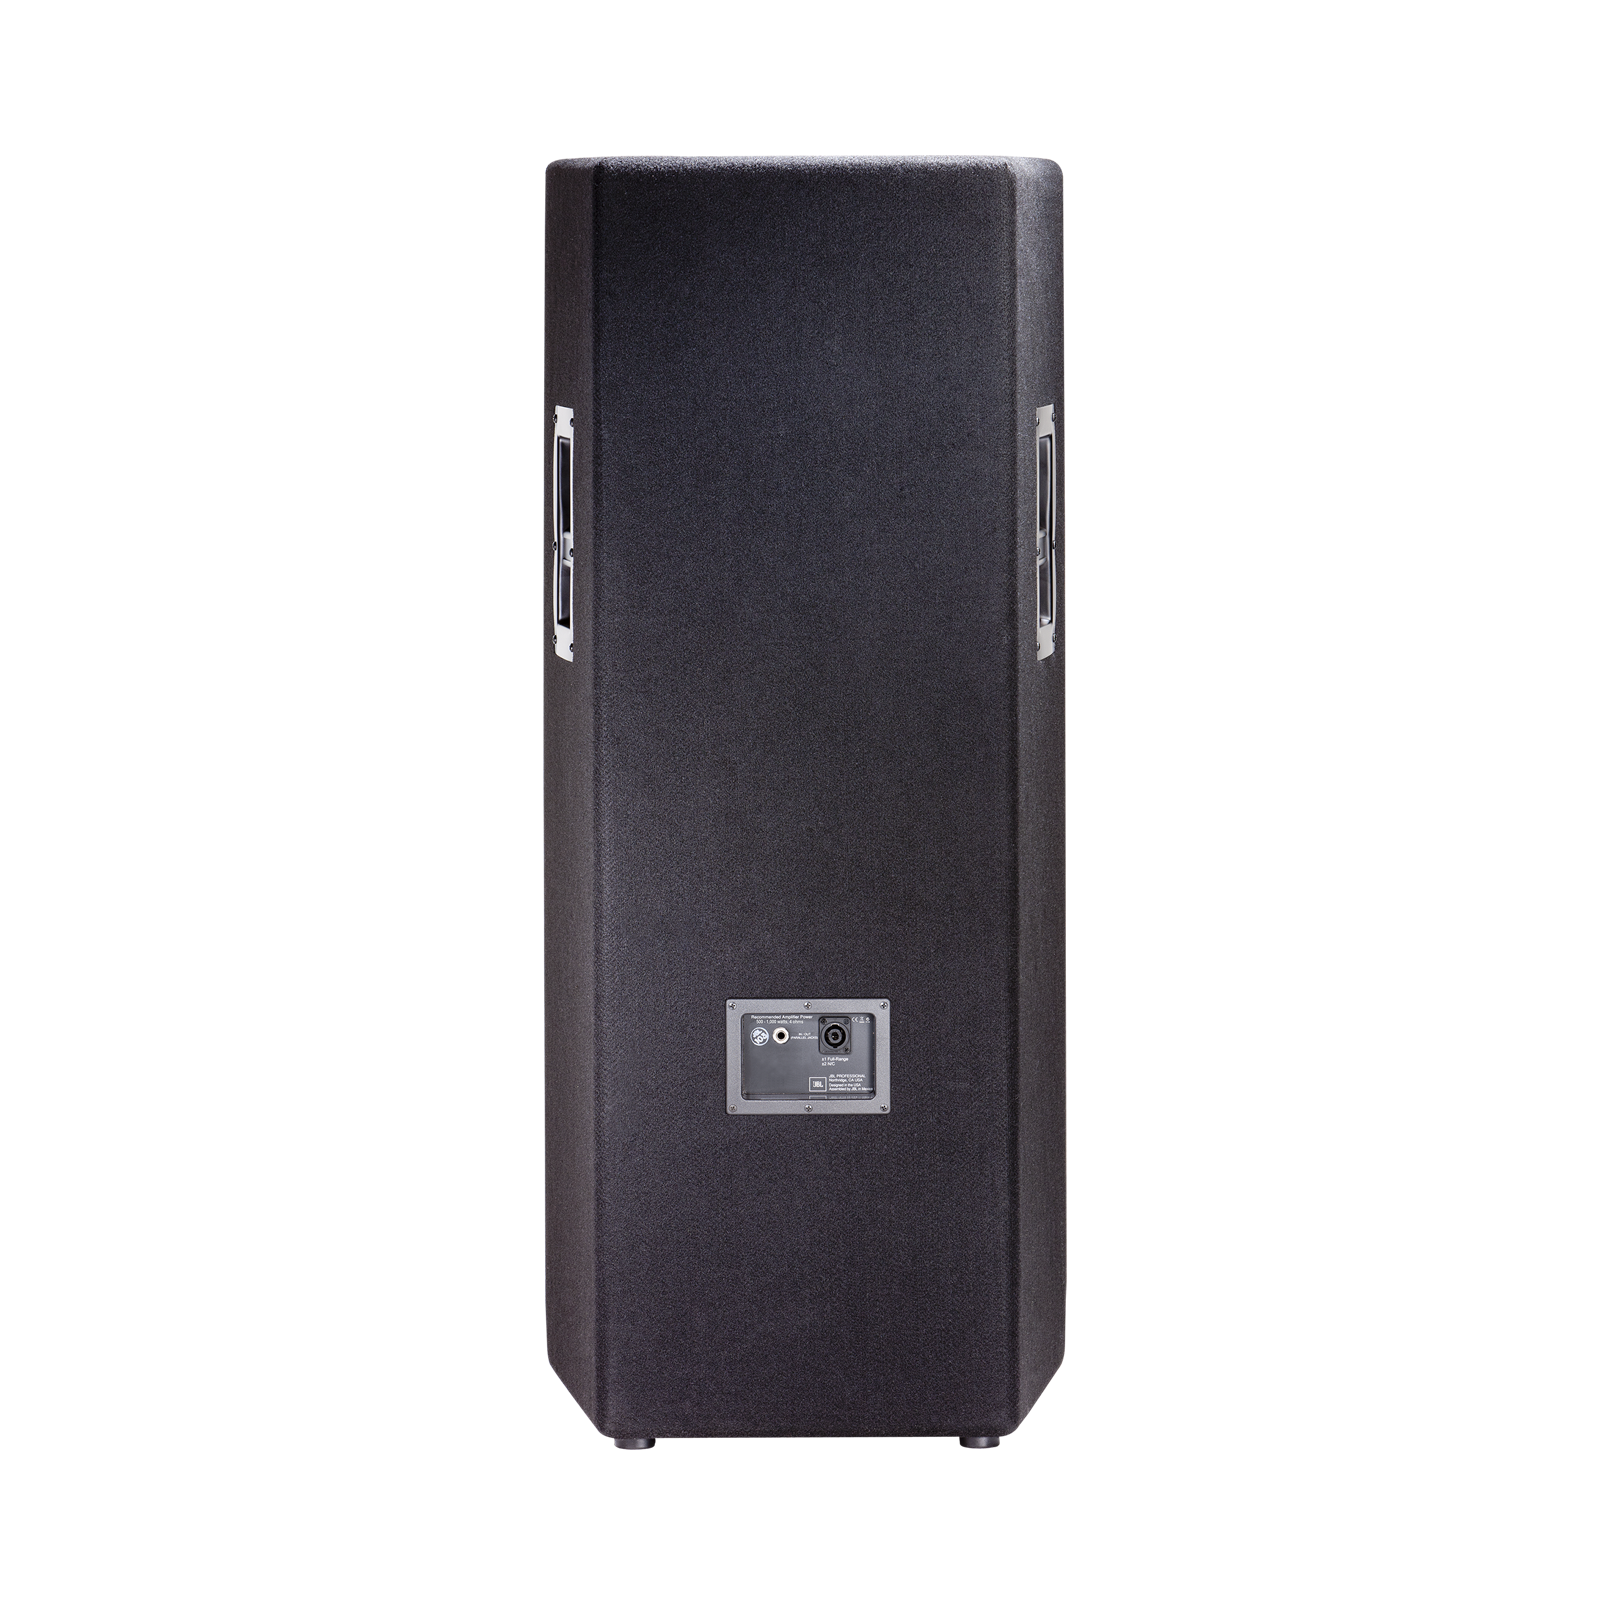 "JBL JRX225 - Black - Dual 15"" Two-Way Sound Reinforcement Loudspeaker System - Back"